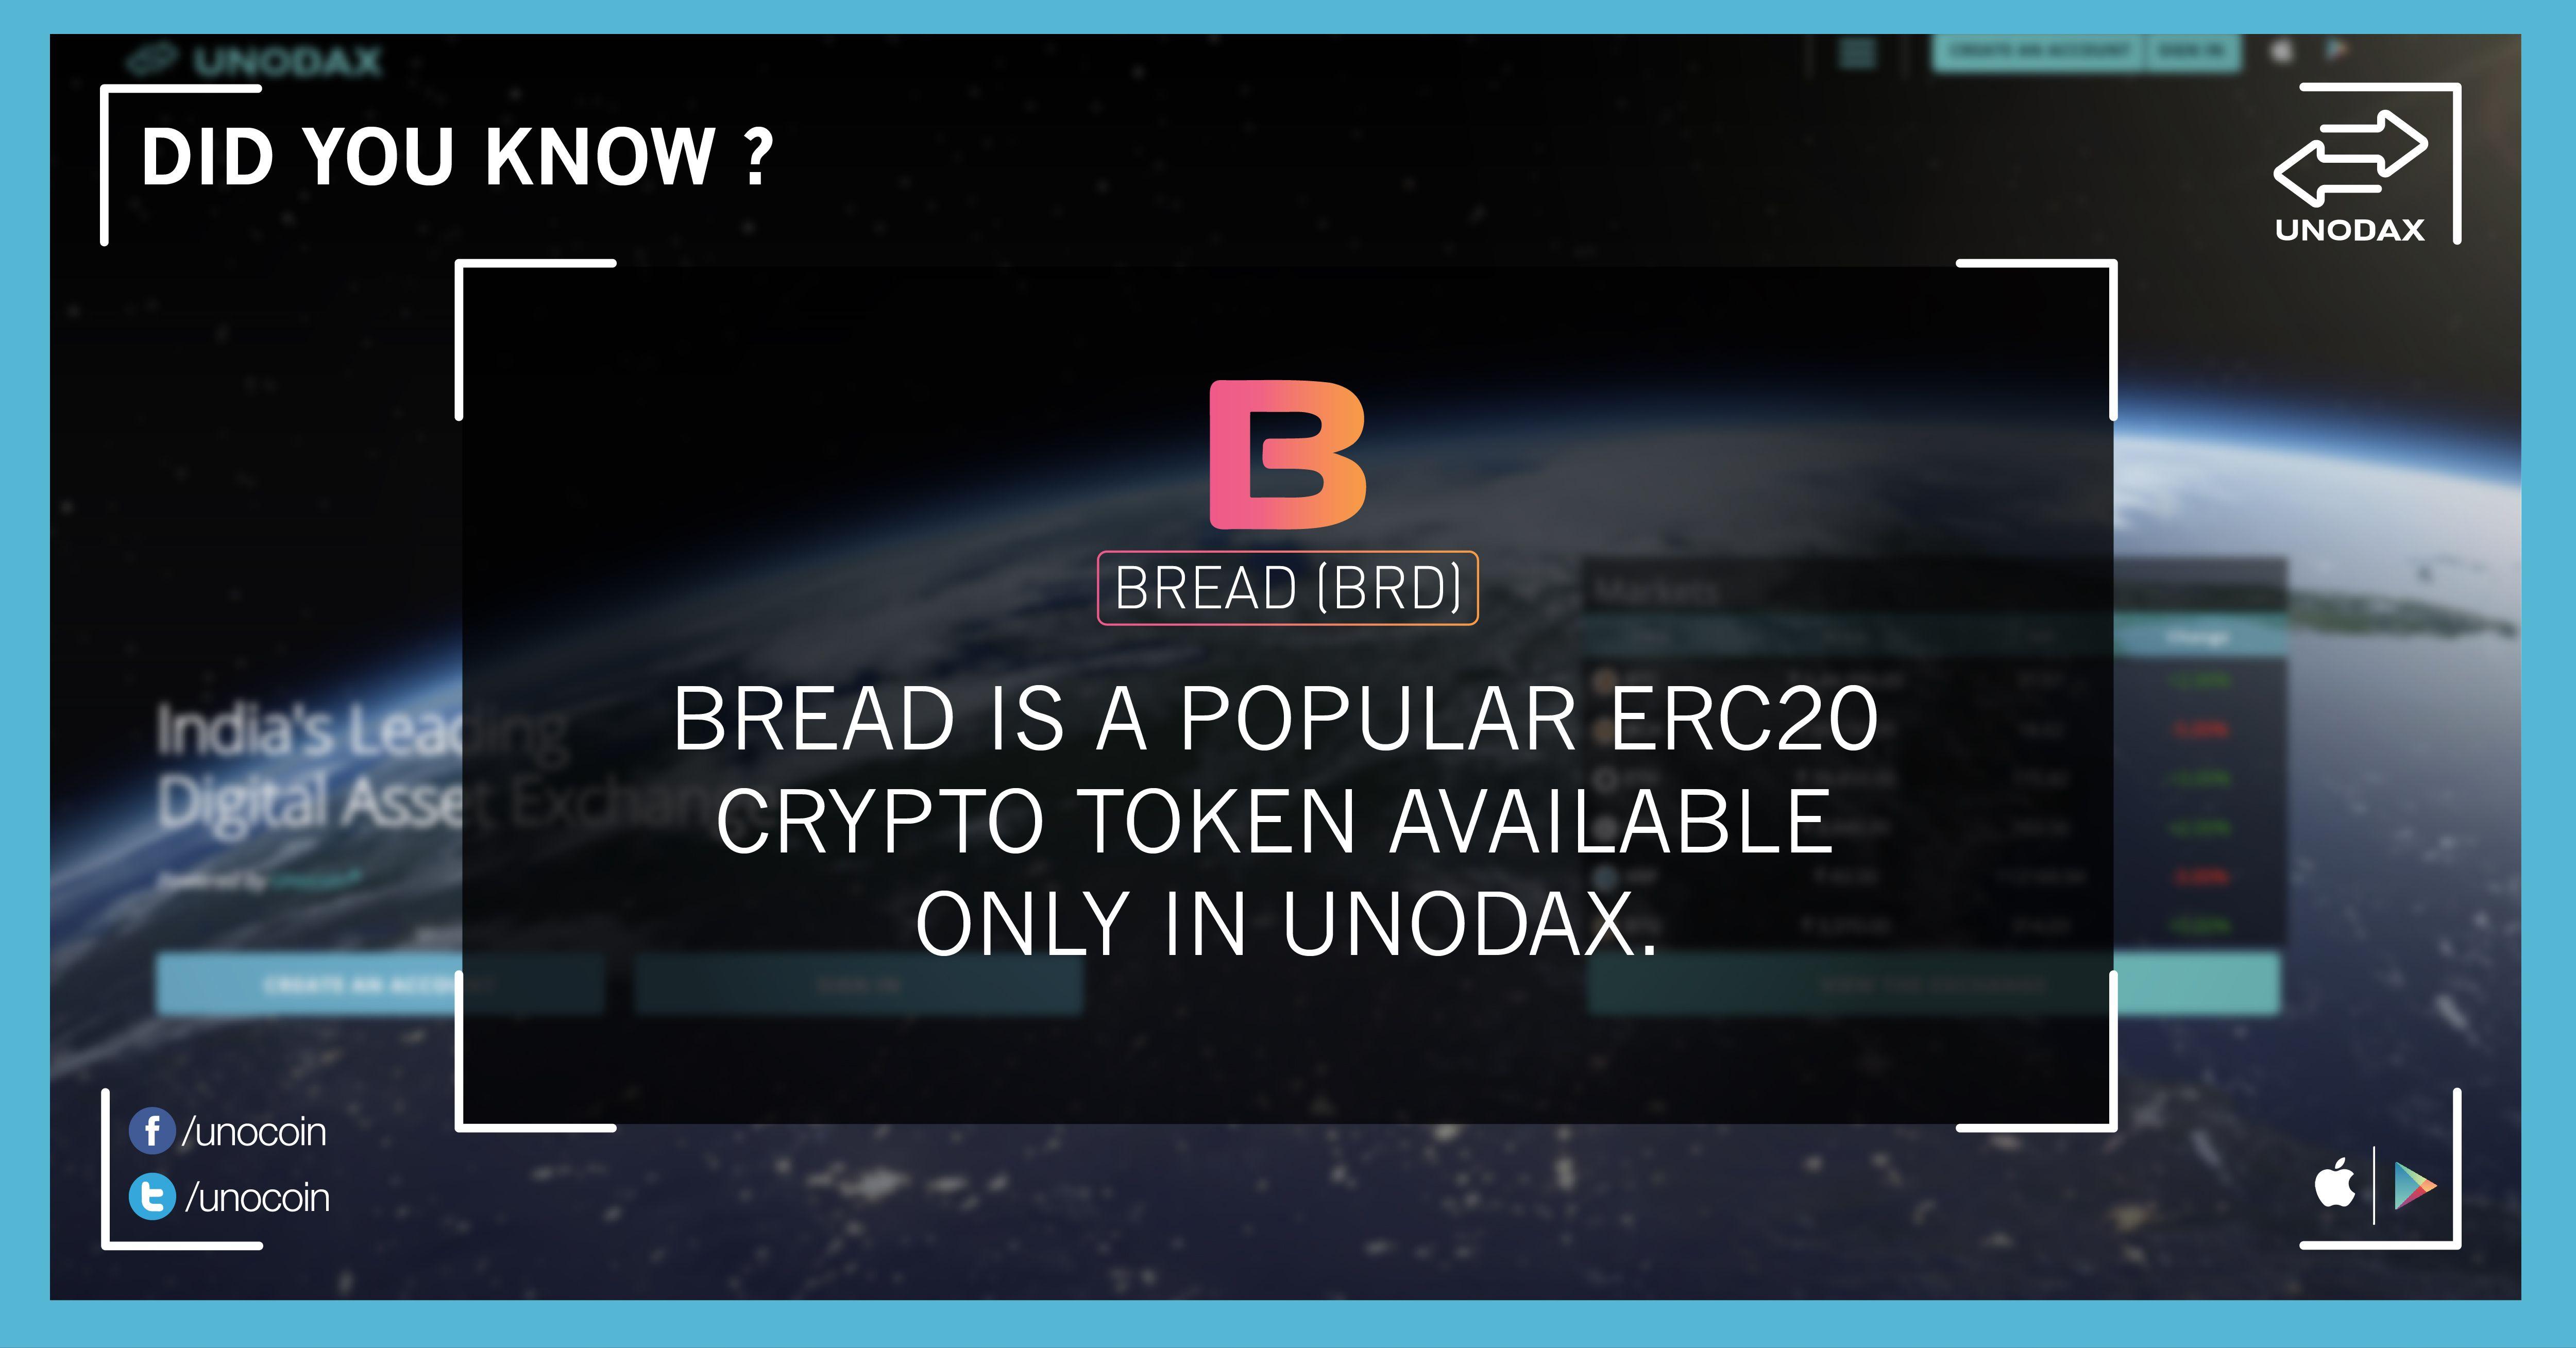 Bread Token is a popular ERC20 crypto token only available